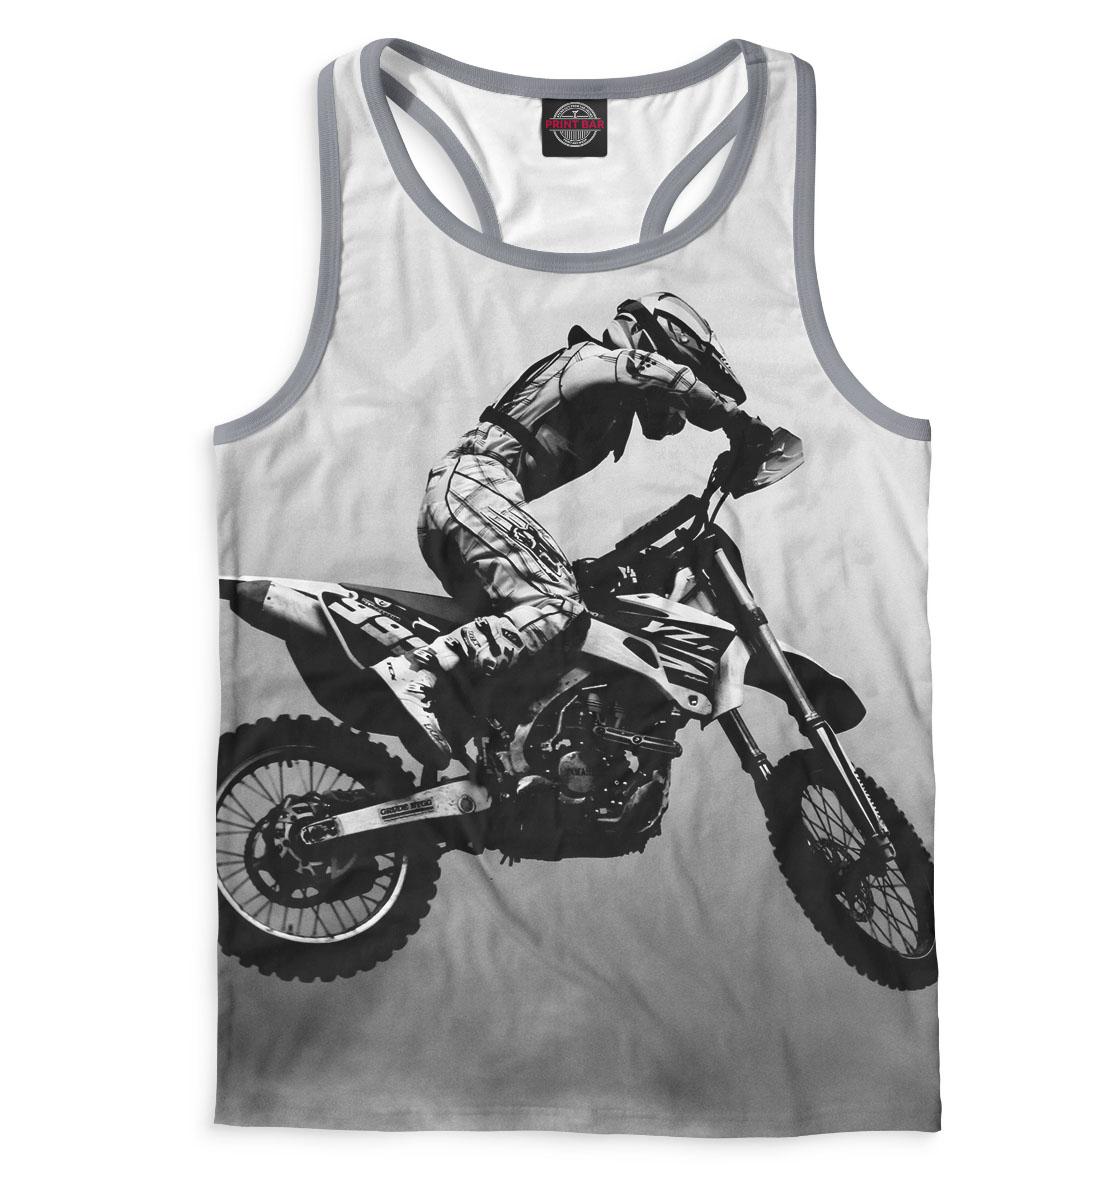 Купить Майка для мальчика Мотоциклист MTR-808148-mayb-2